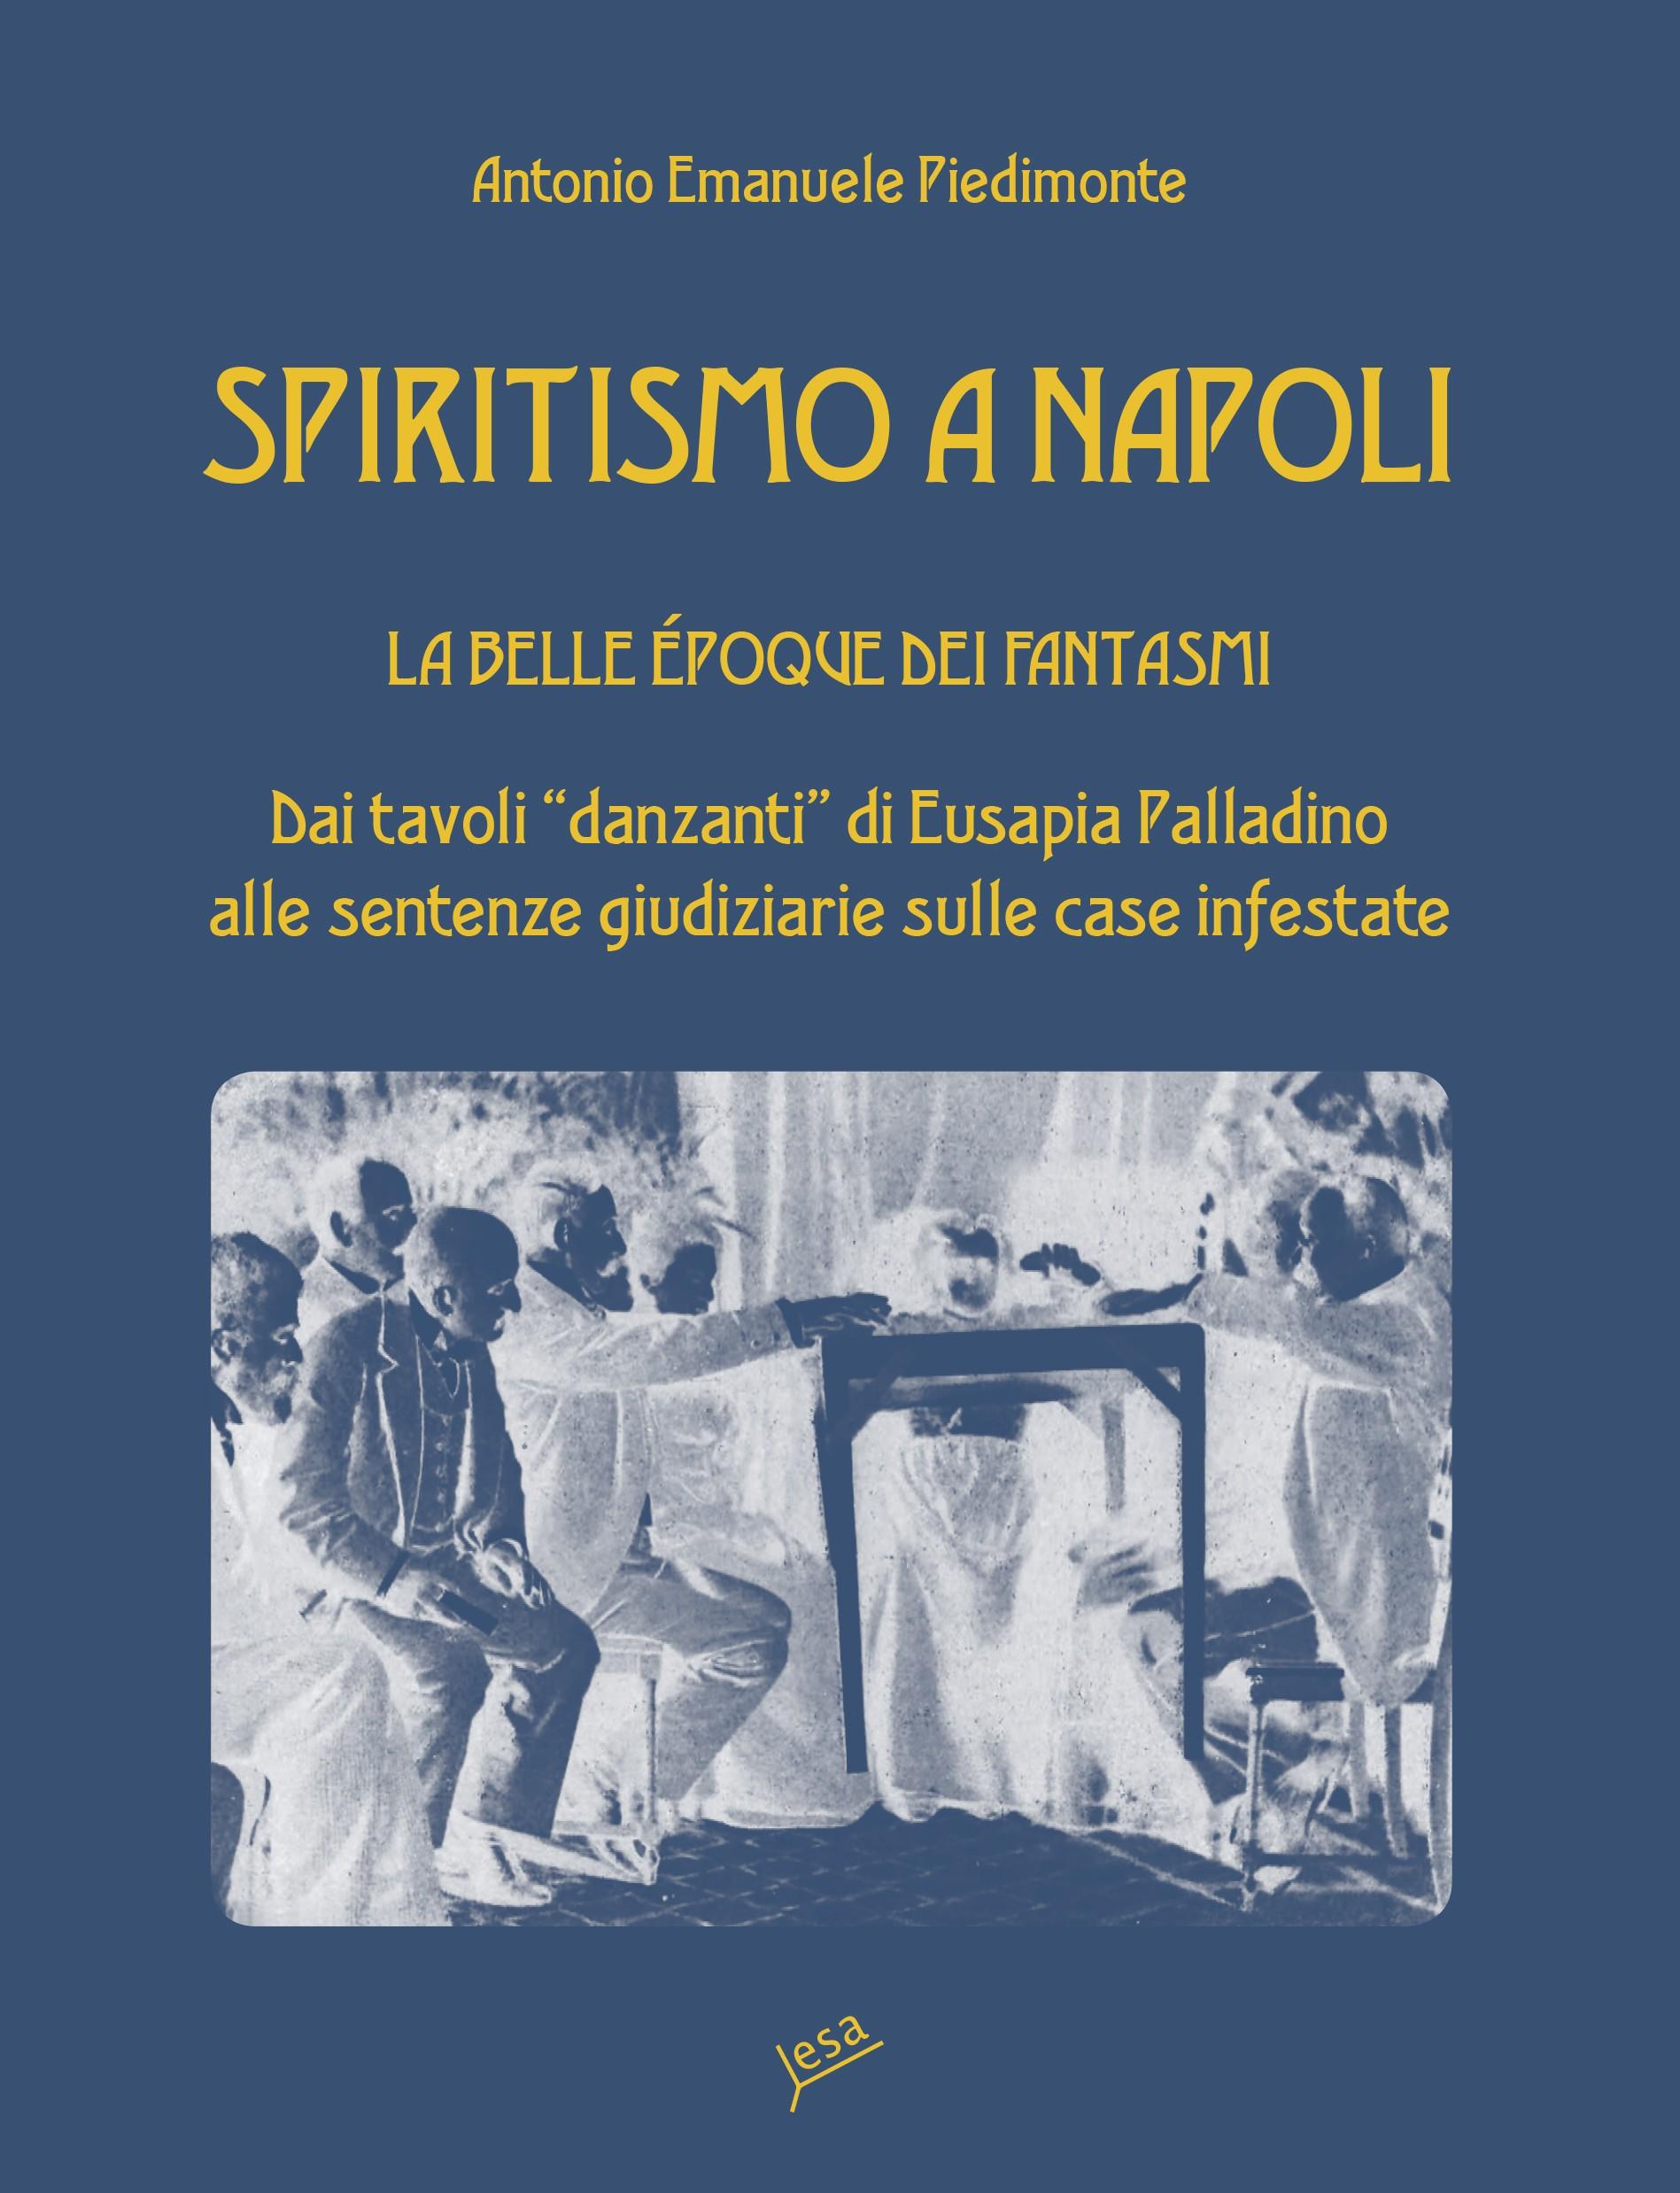 Spiritismo a Napoli